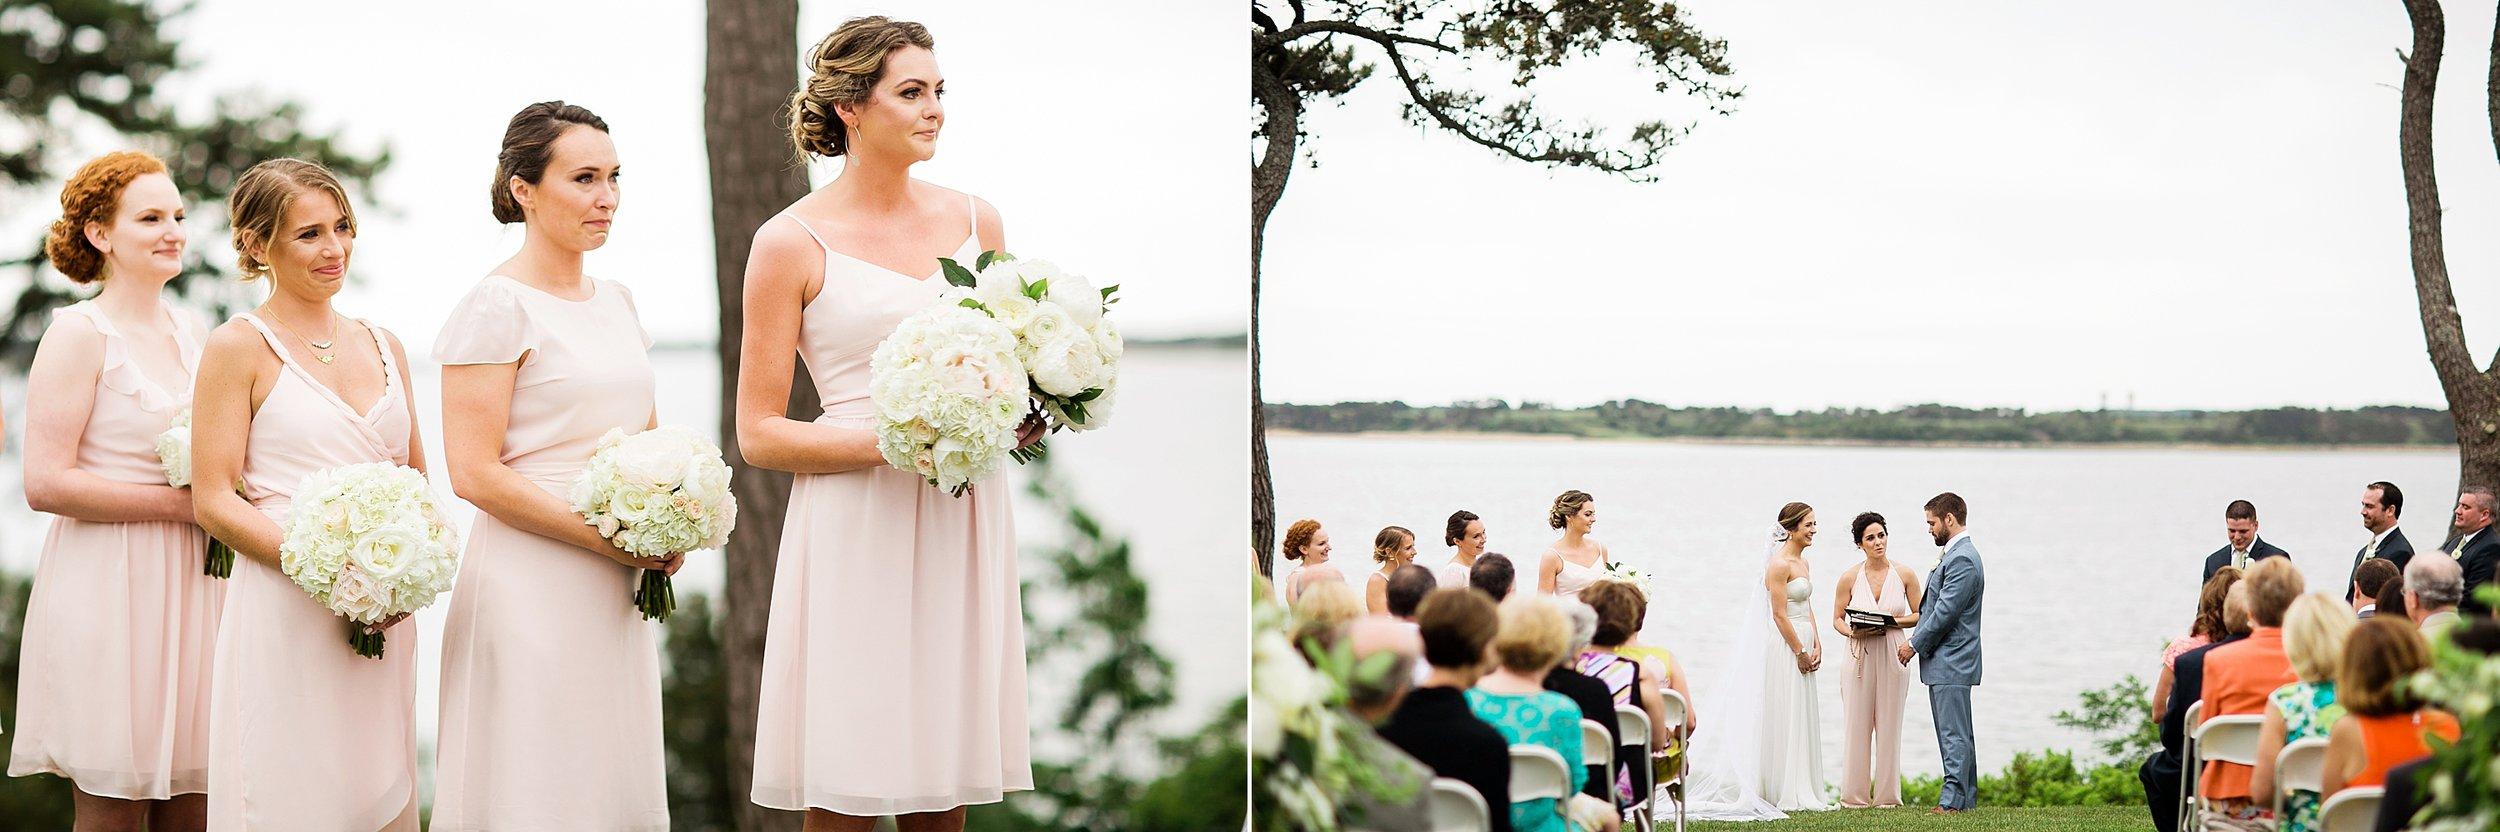 033 los angeles wedding photographer todd danforth photography cape cod.jpg